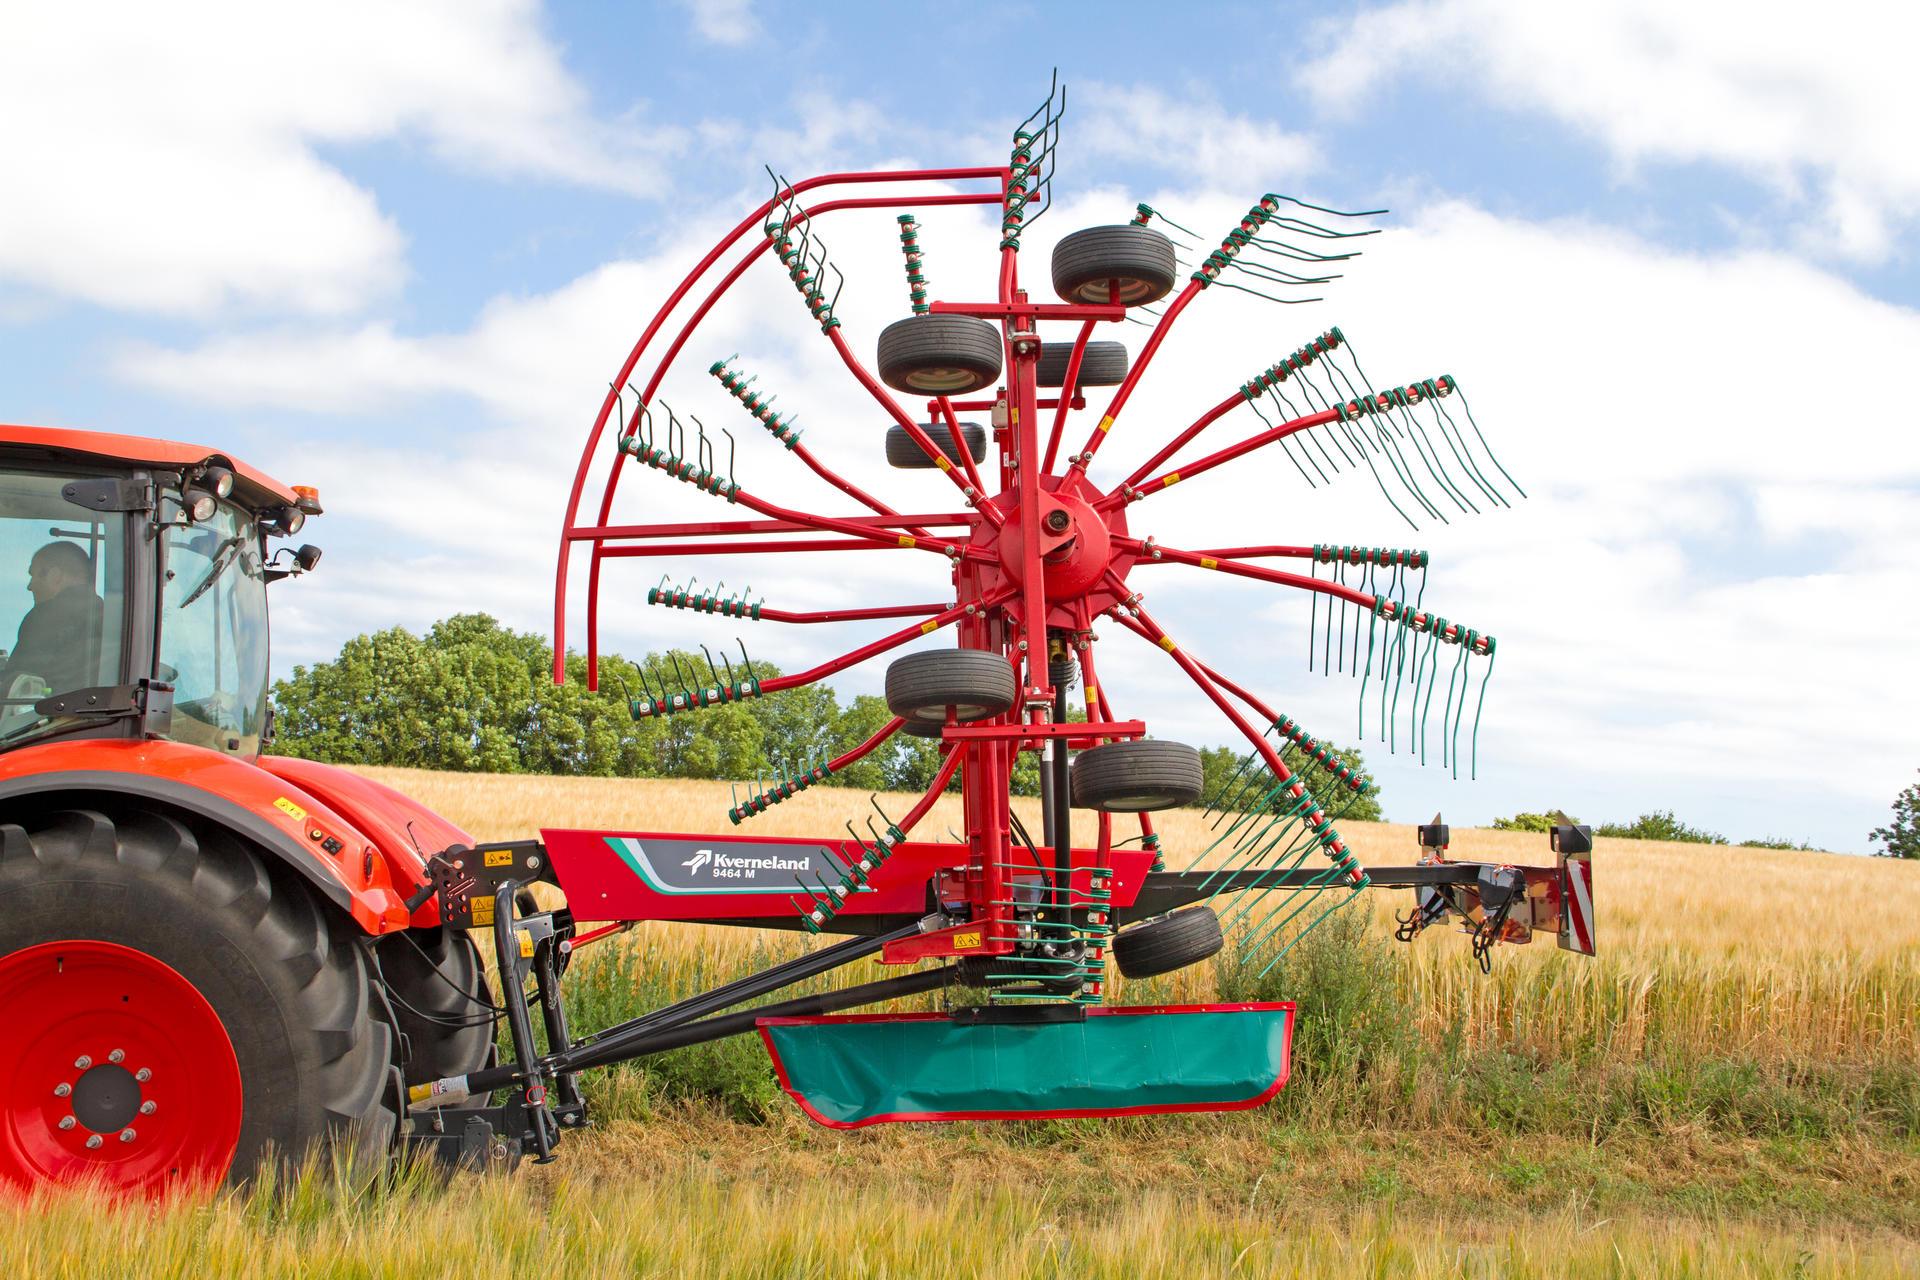 Kverneland 9464m Compactline Rake With Working Width Of 64m Spinning Bike Tl 8555 9464 M